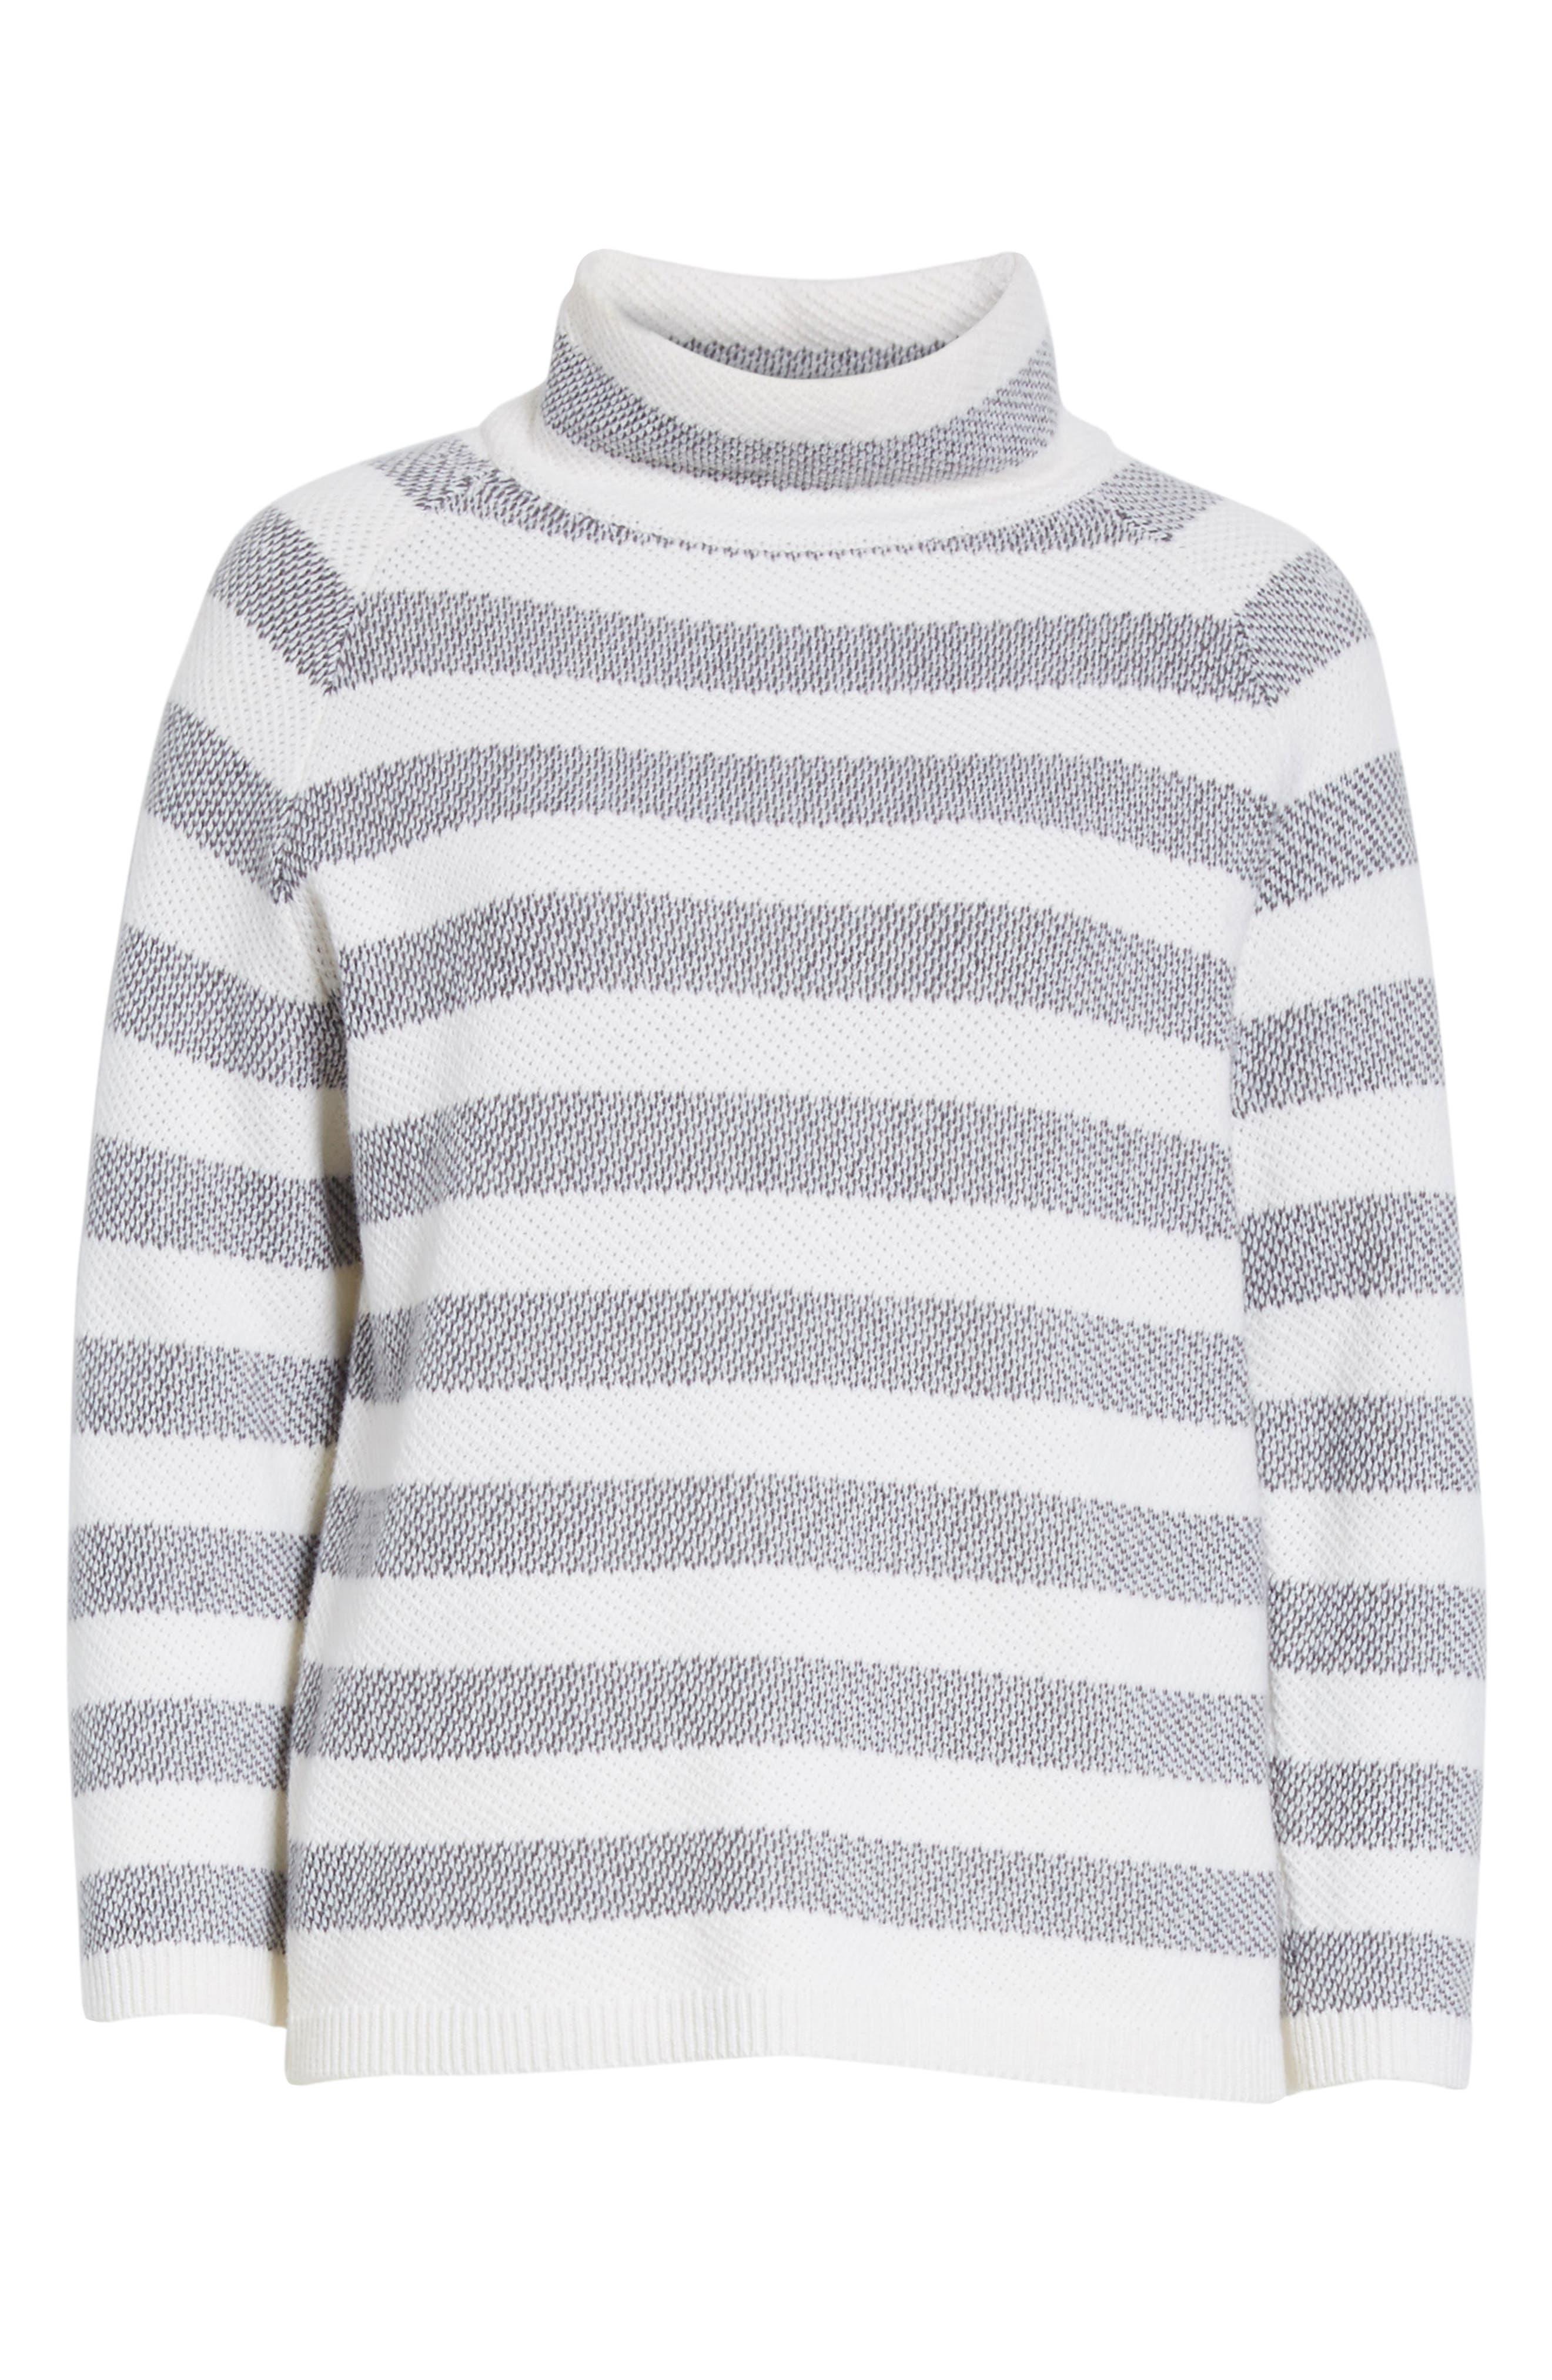 Osvaldo Cashmere Sweater,                             Alternate thumbnail 6, color,                             034